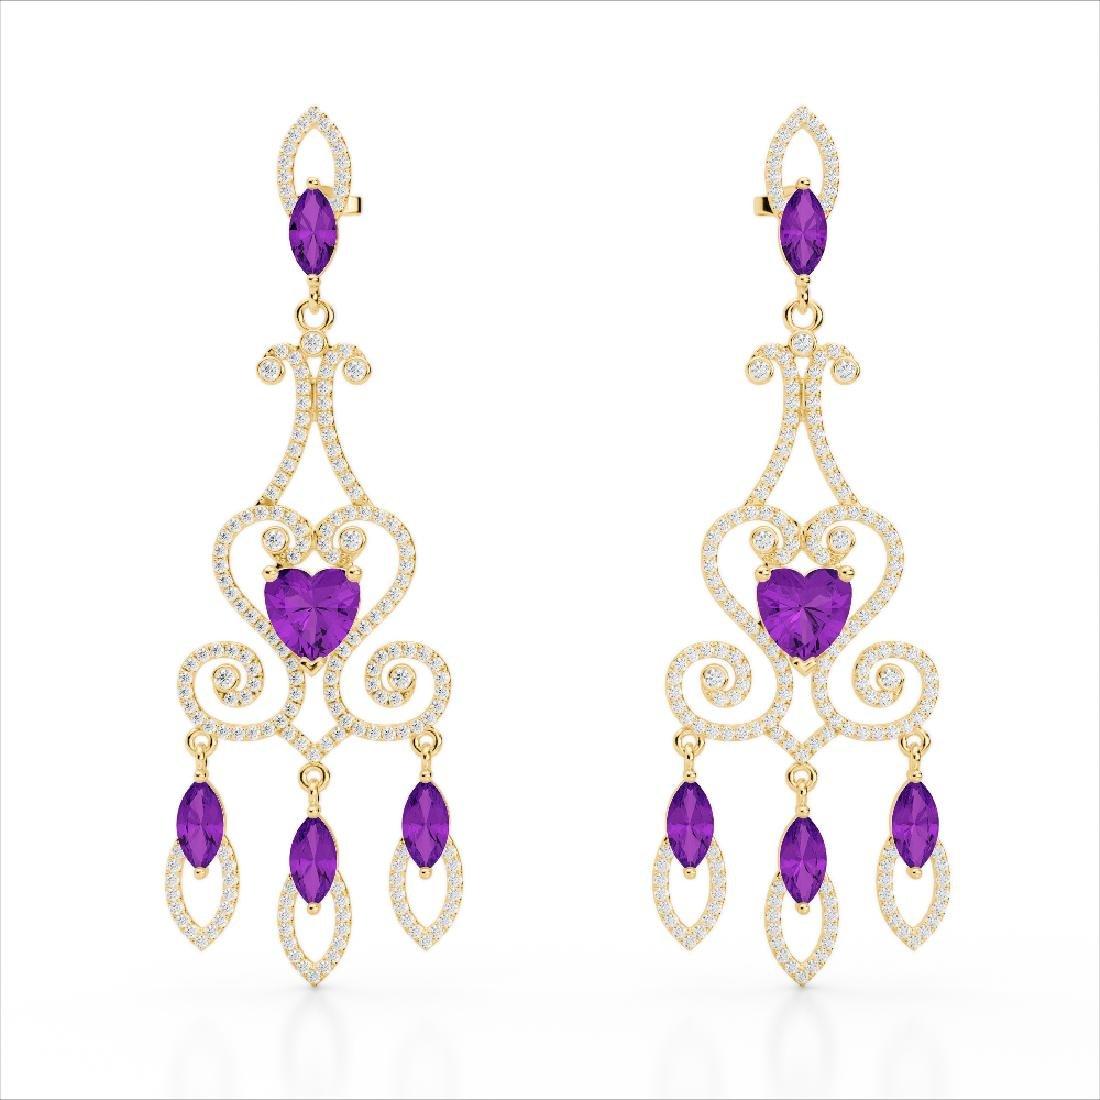 11 CTW Amethyst & Micro Pave VS/SI Diamond Earrings 14K - 2